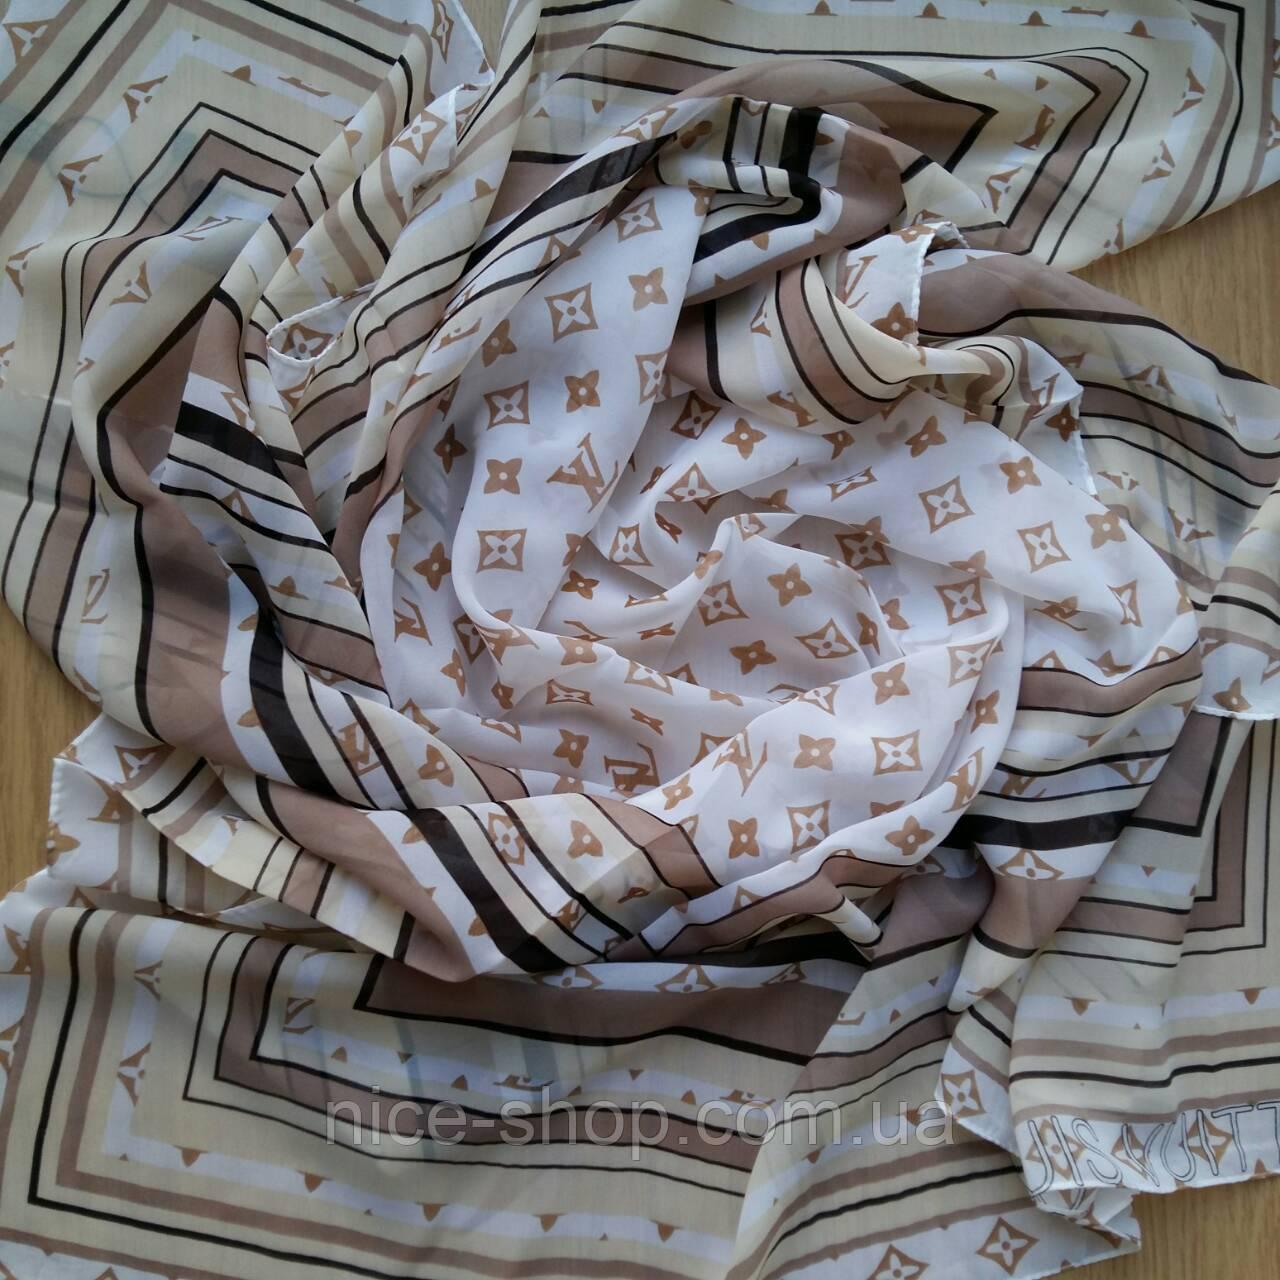 2d4cf9544ba8 Платок Louis Vuitton тонкий   продажа, цена в Одессе. платки, шали ...